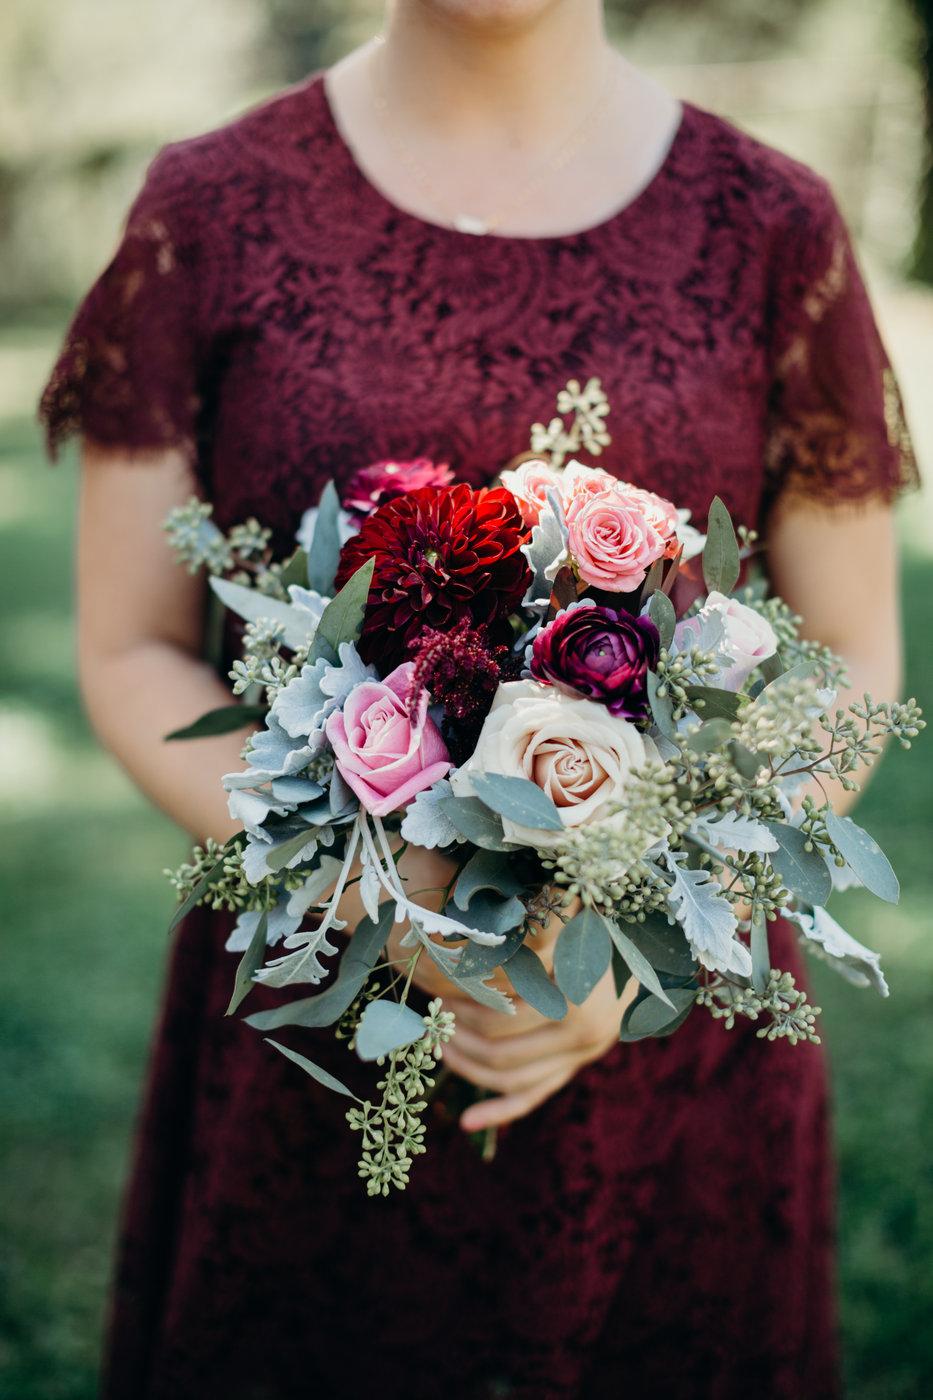 Ryan Jessica-Bridal Party-0207.jpg